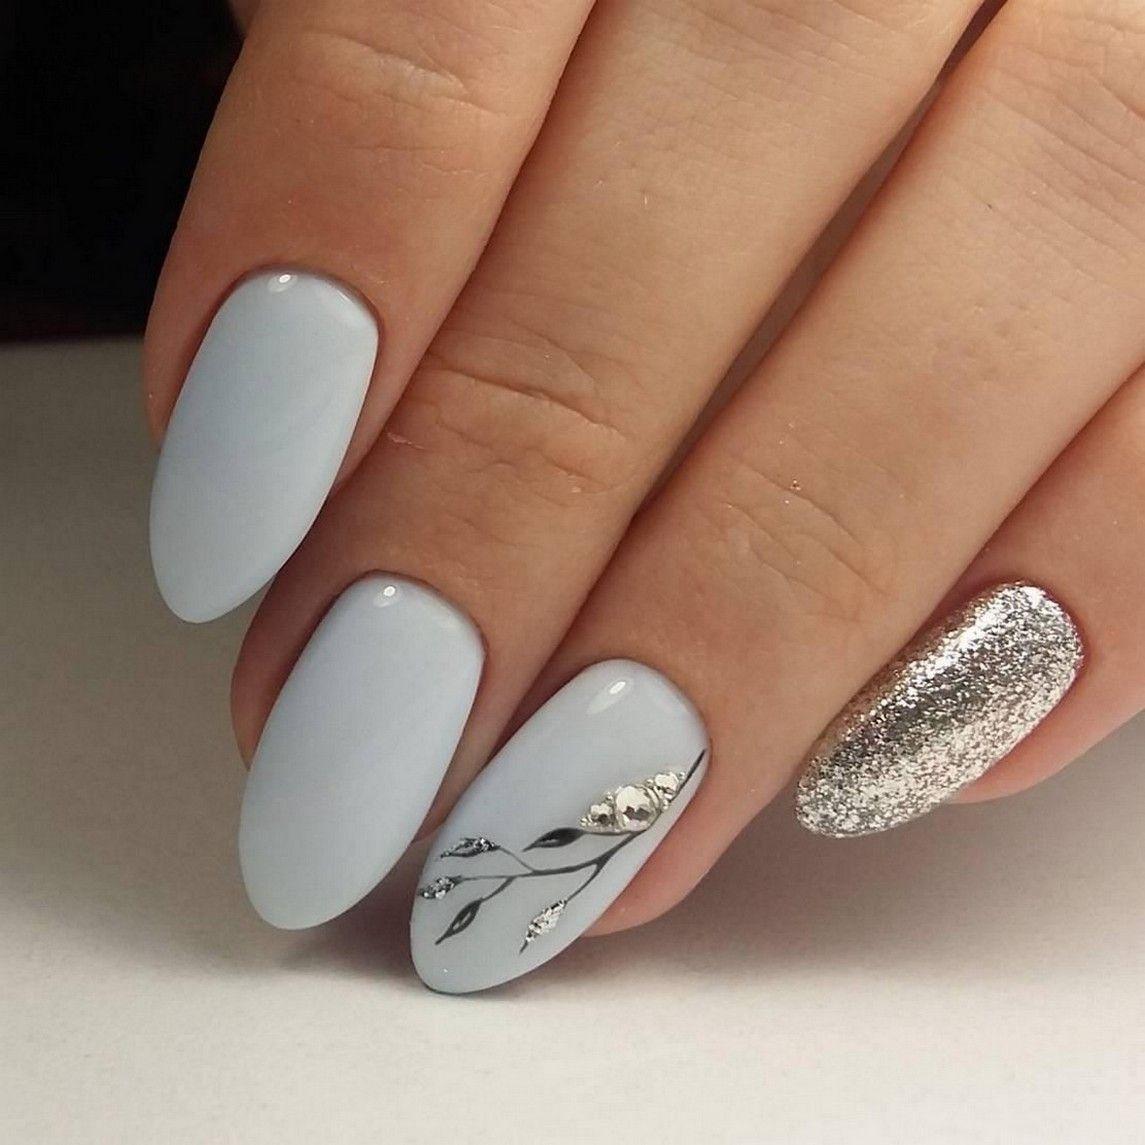 47 Simple Nail Art Design for This Winter Season Inspiration in 2020 | Winter nail designs, Classy nail designs, Simple nail art designs